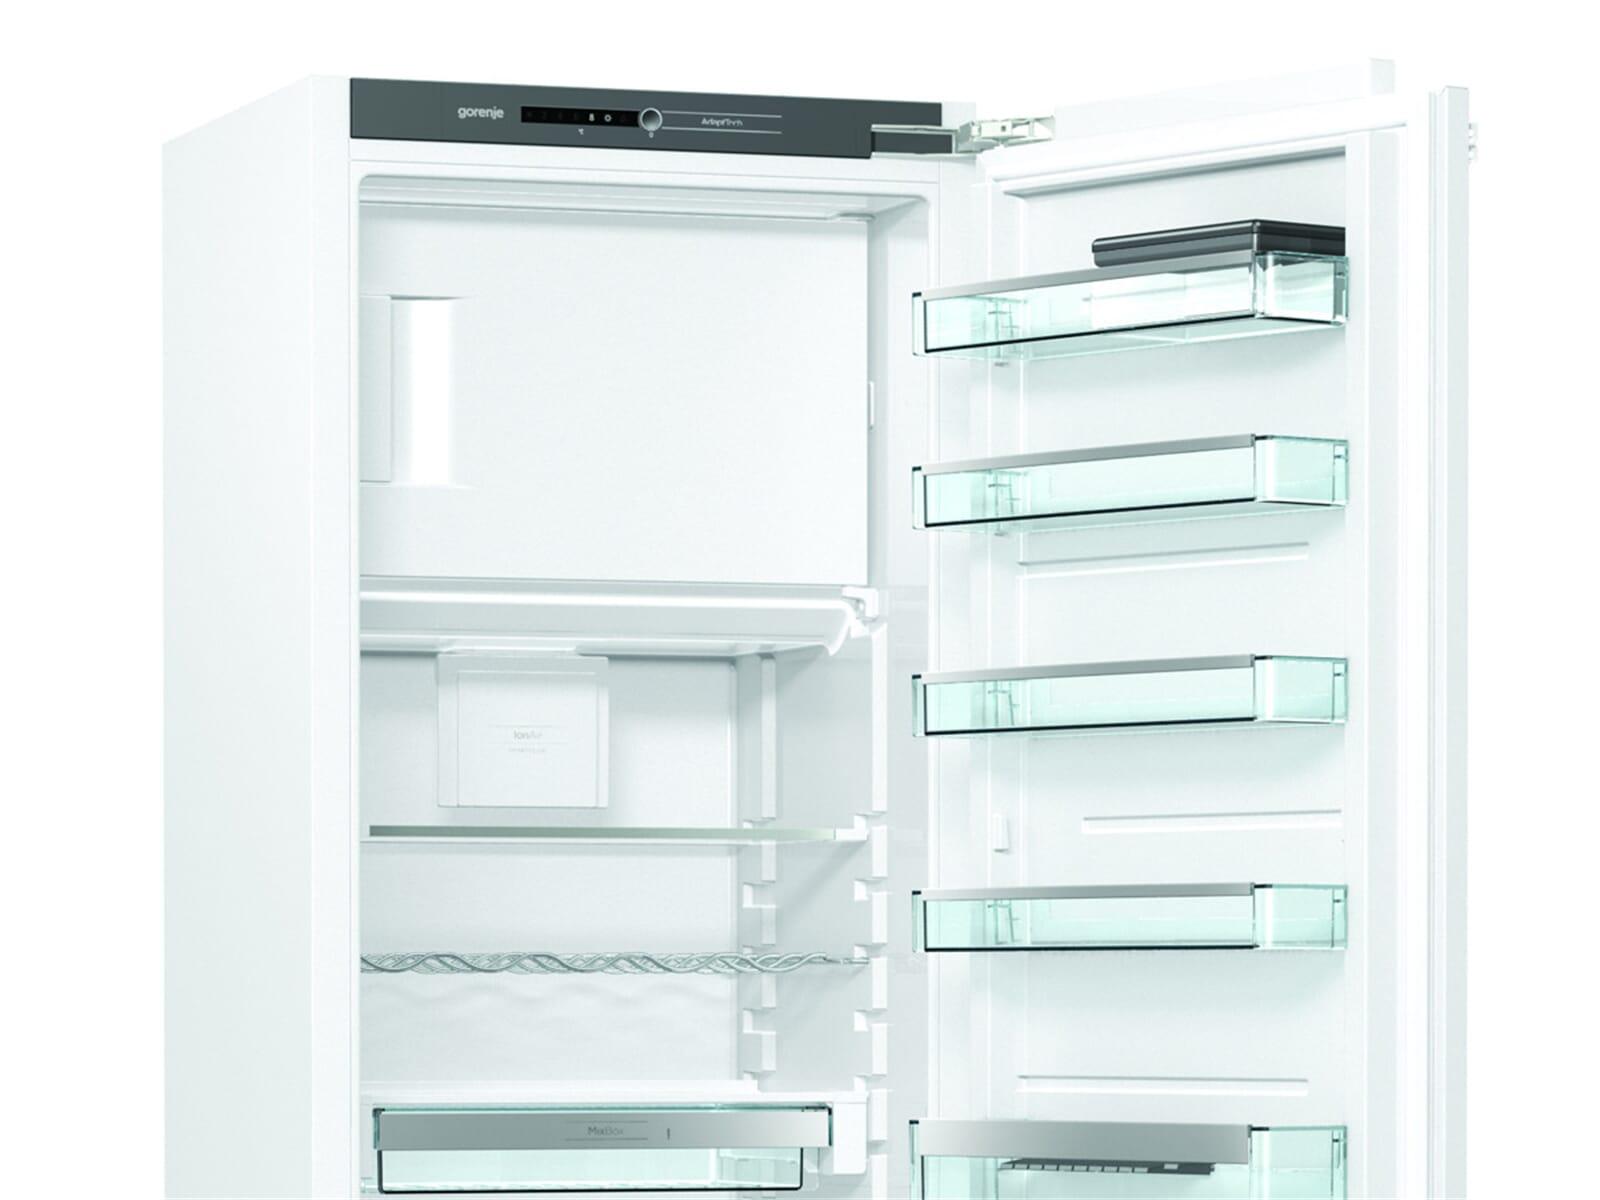 Gorenje Einbau Kühlschrank 122 Cm : Gorenje einbaukühlschrank kühlschrank integrierbar deptis gt